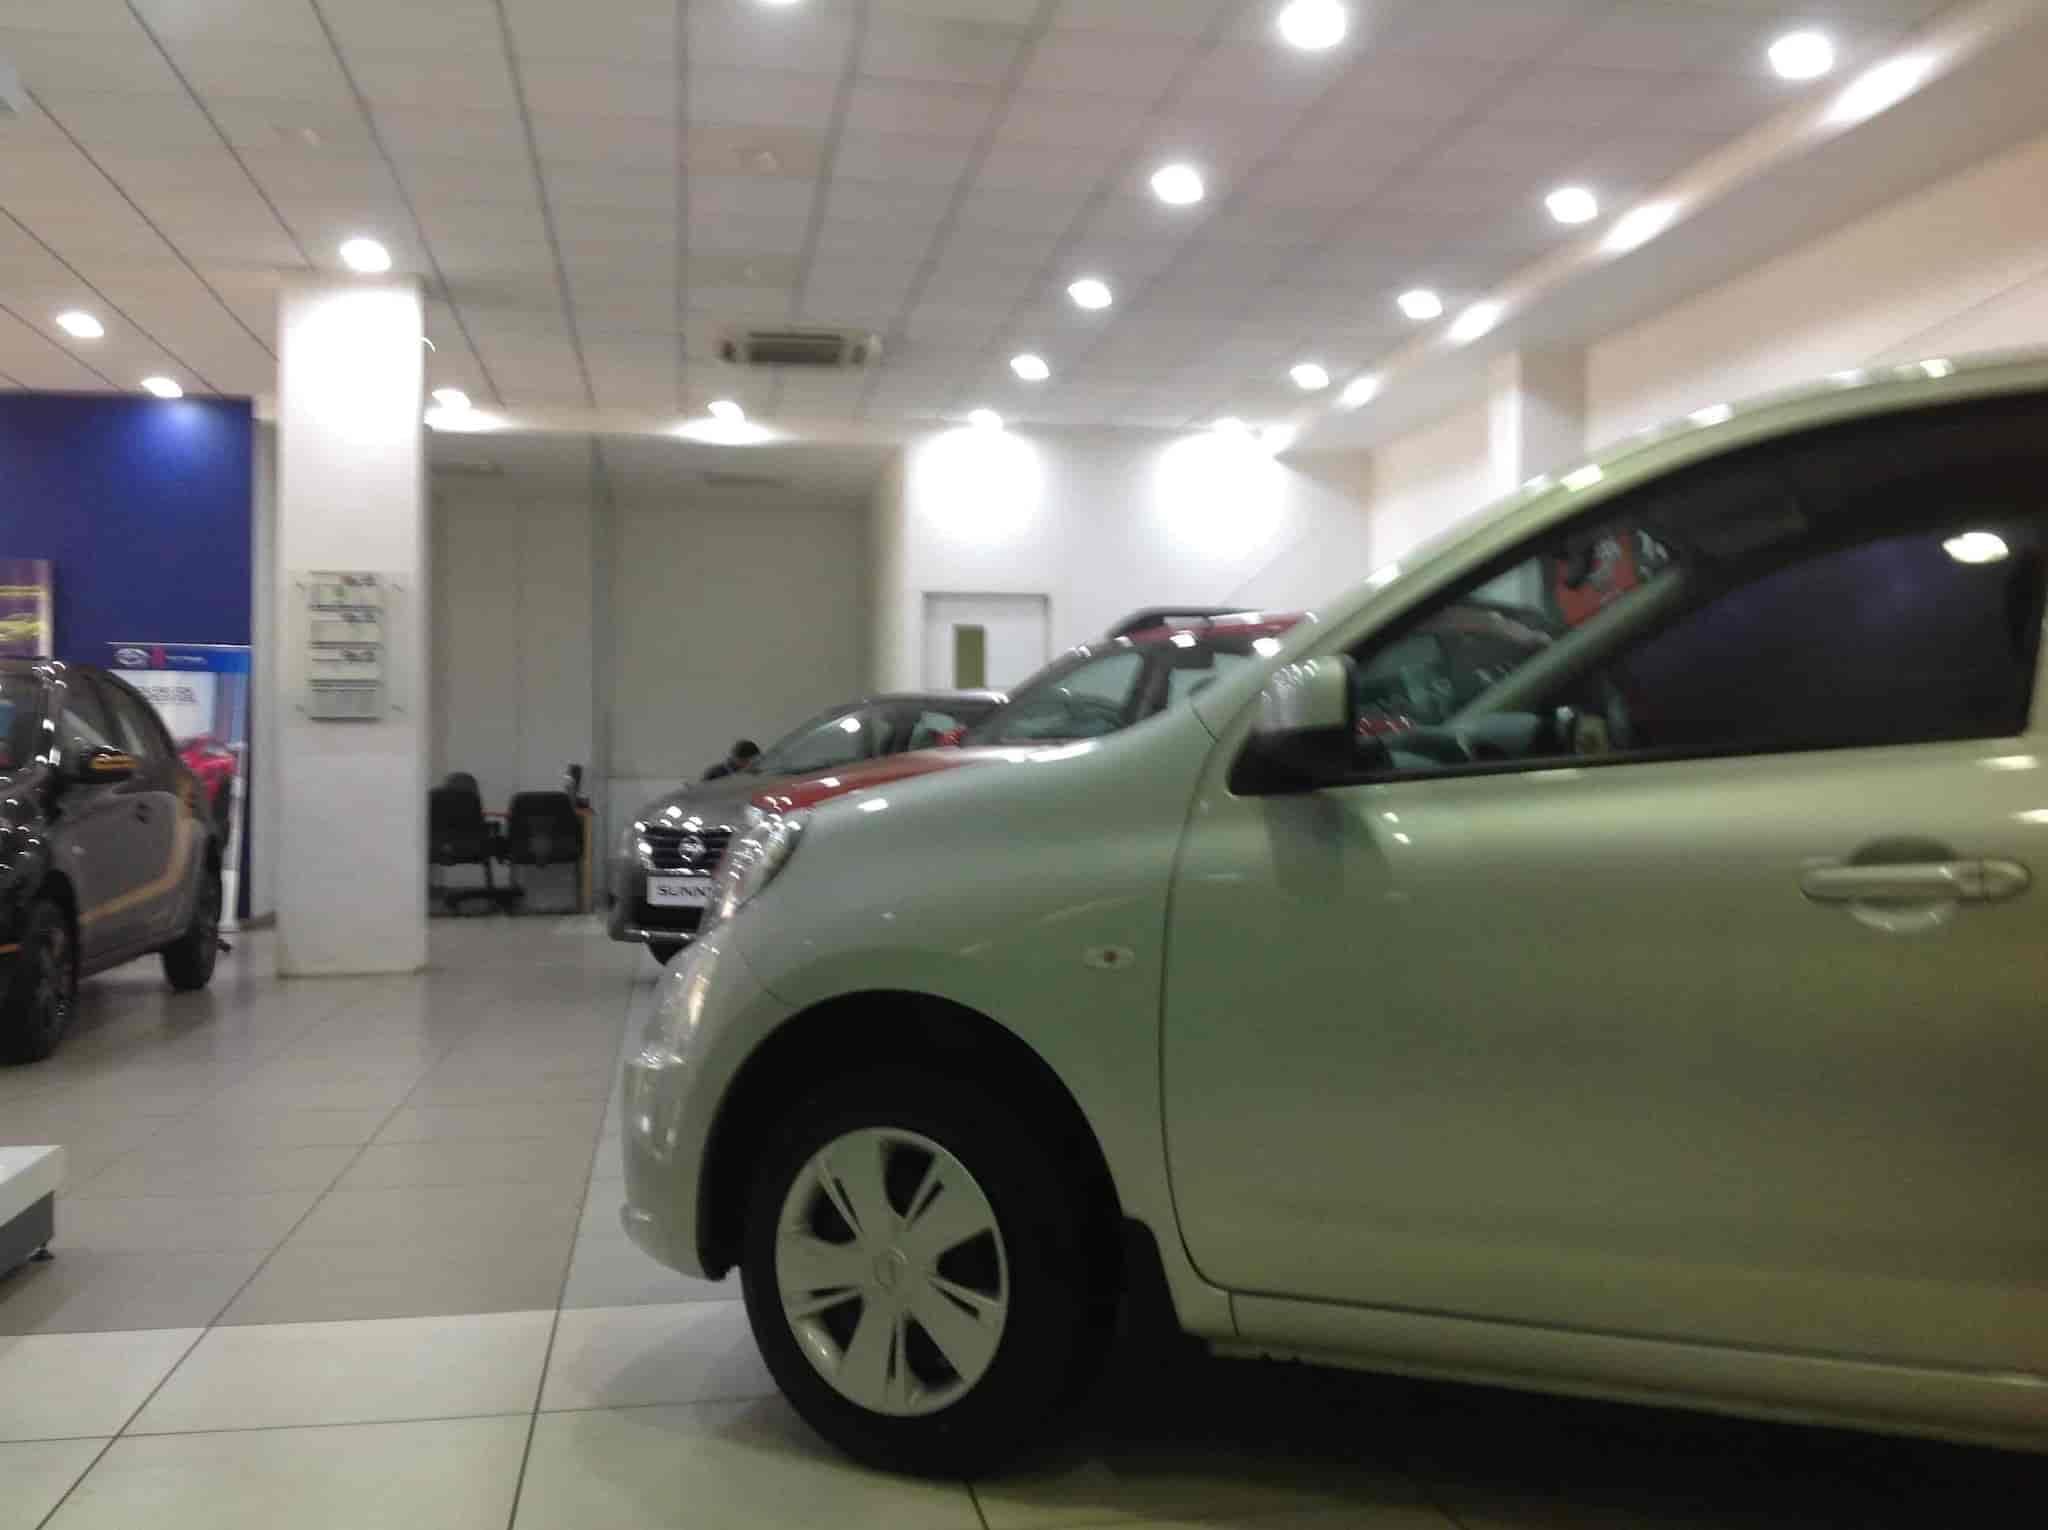 niissan md nissan east london dealers hopkins officially dealership in opens publish car of new glyn hopkin